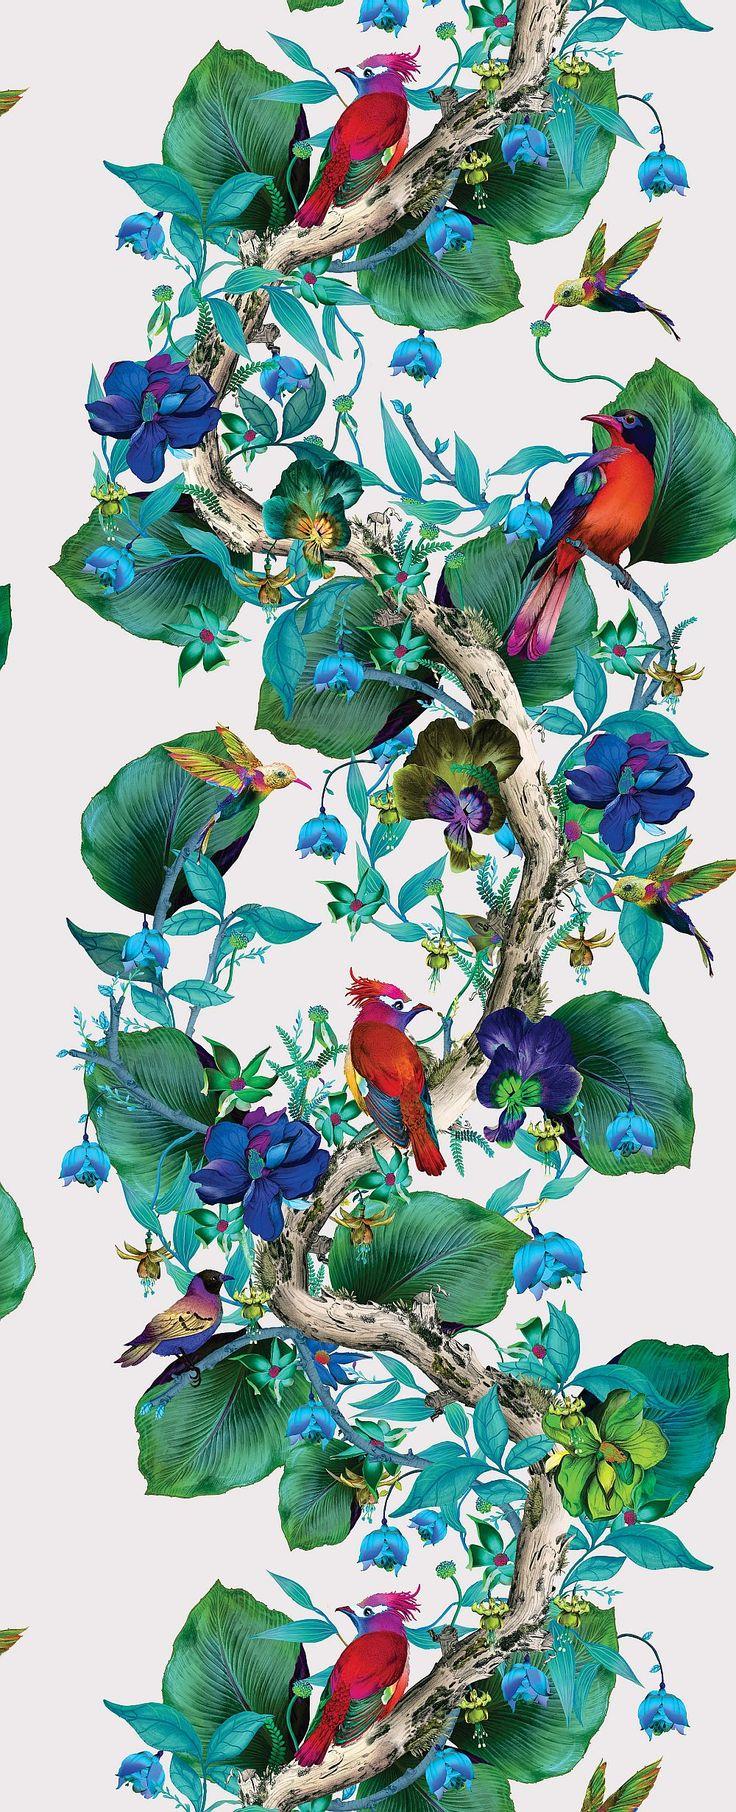 Osborne & Little Rain Forest Emerald / Ruby Wallpaper extra image